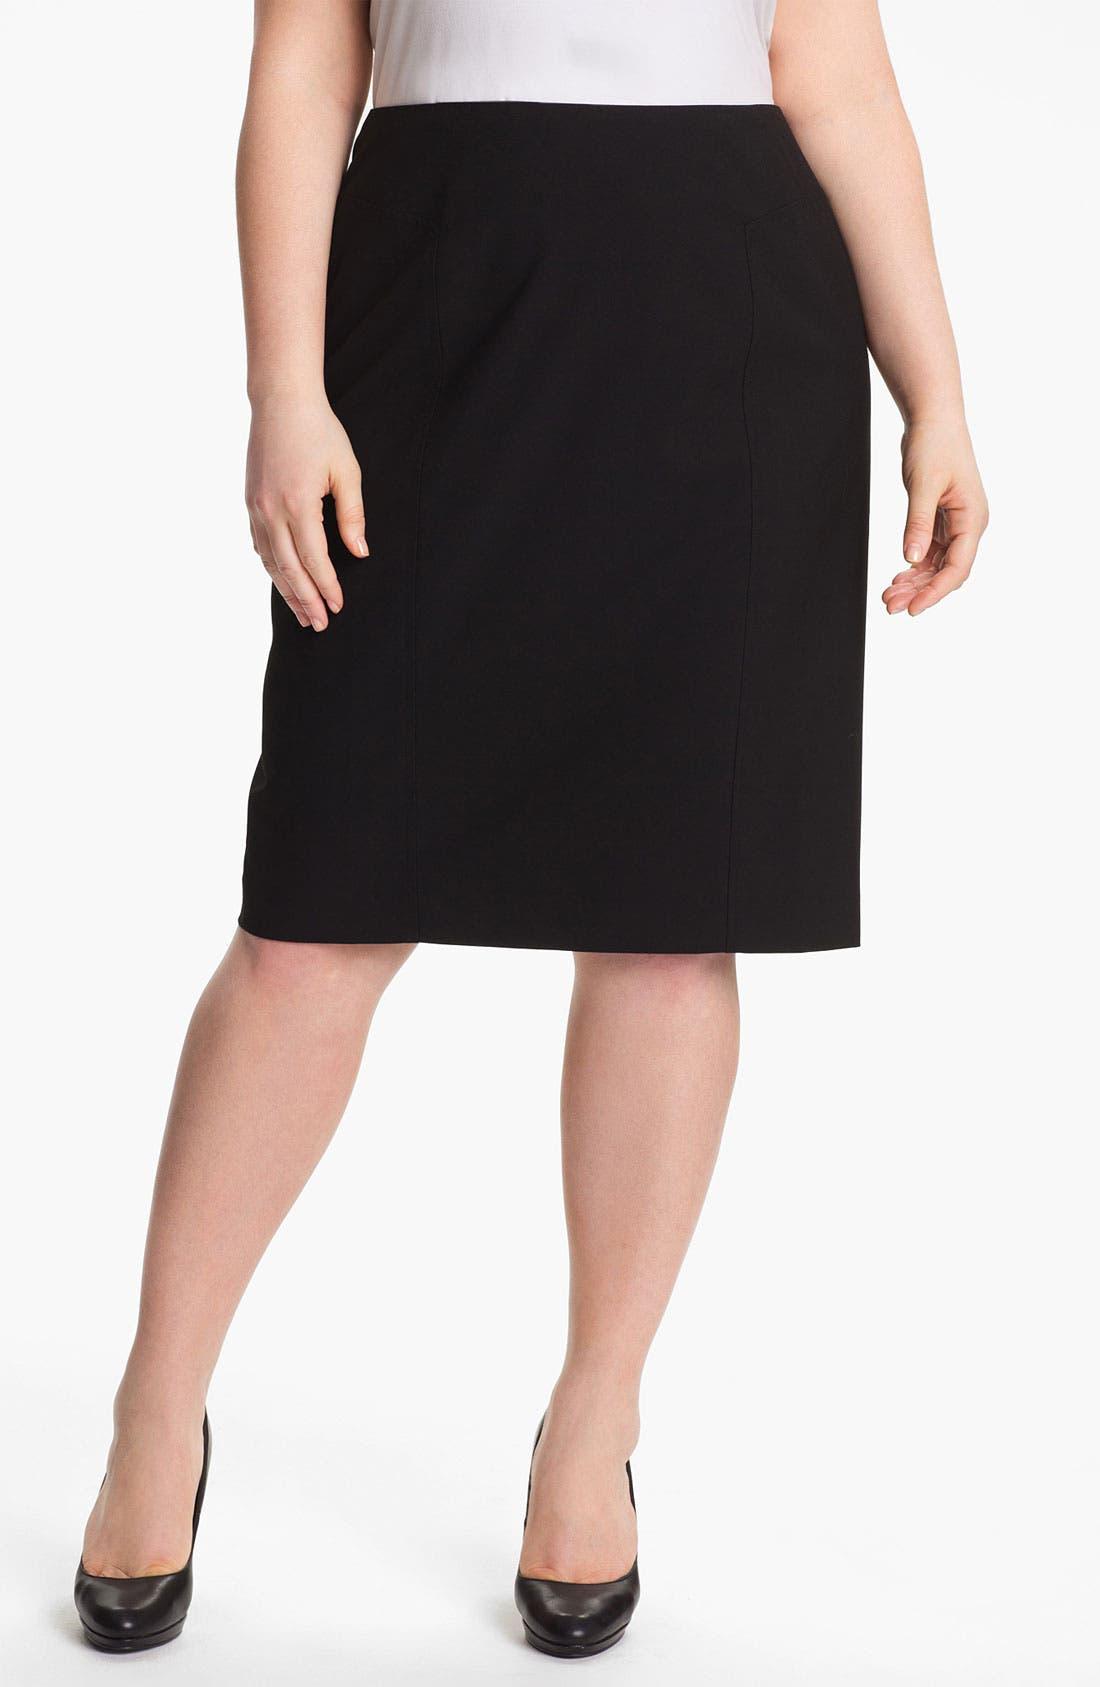 Alternate Image 1 Selected - Sejour 'Ela' Pencil Skirt (Plus Size)